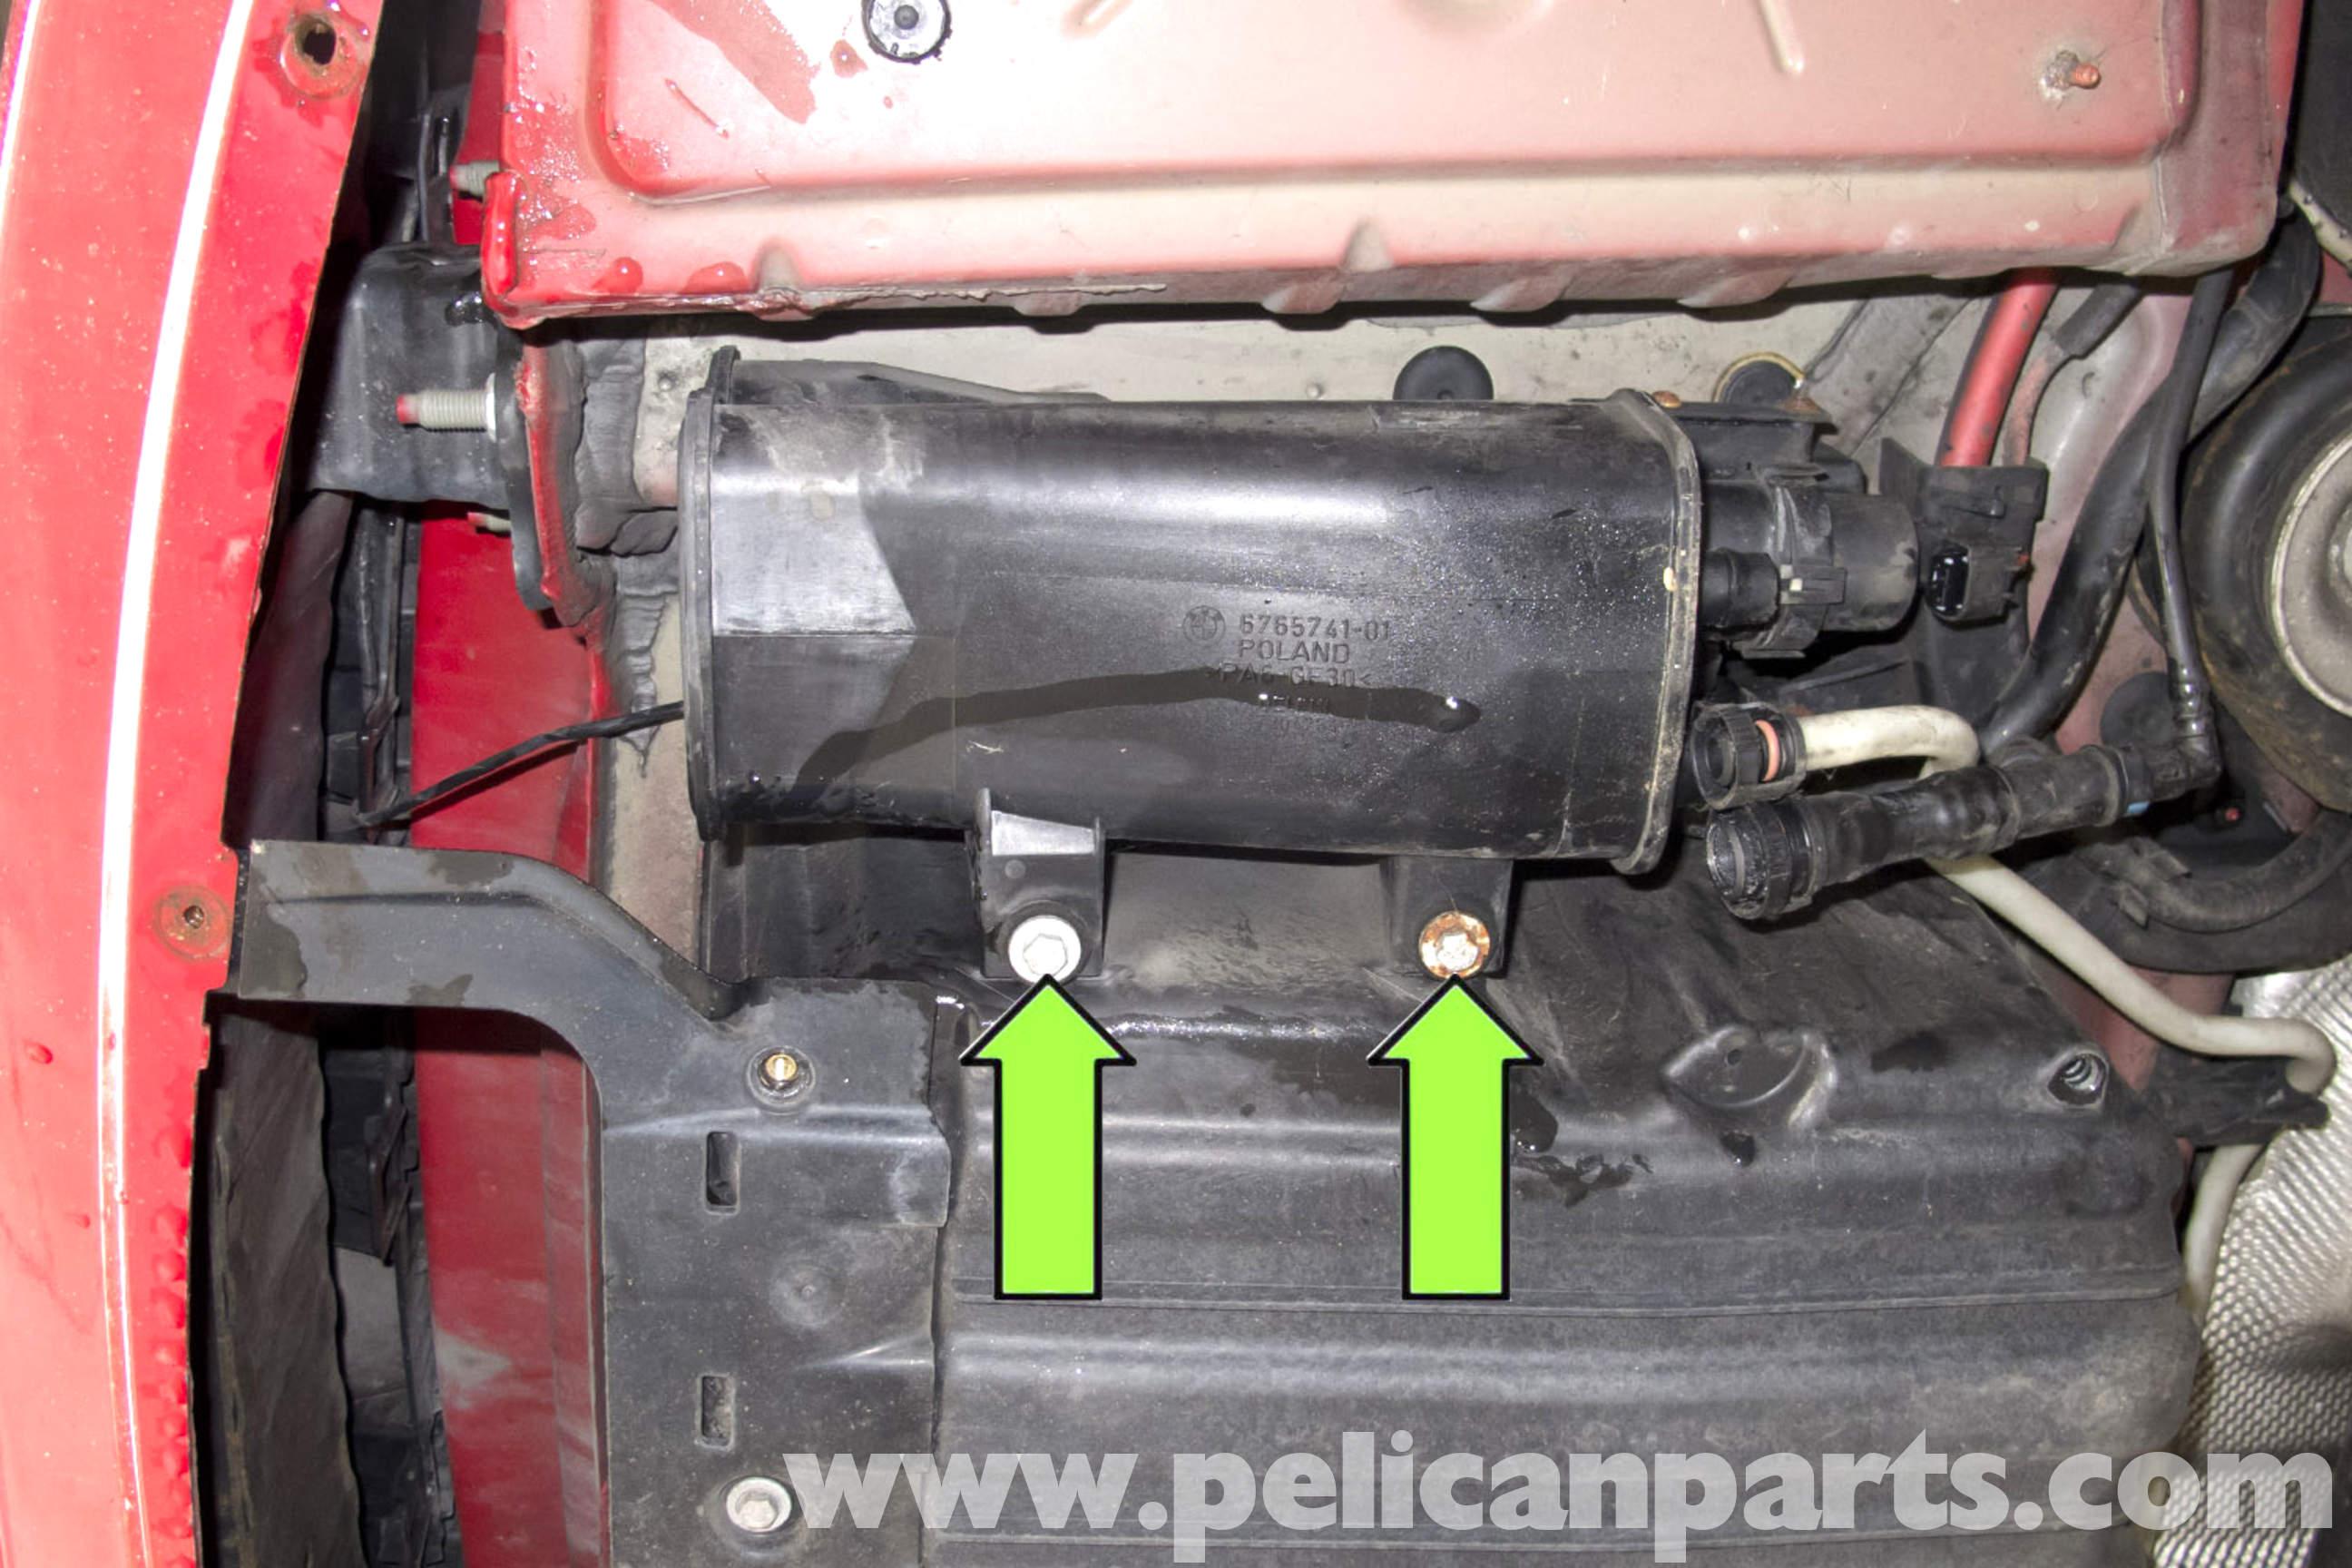 BMW E90 Charcoal Canister Replacement  E91 E92 E93  Pelican